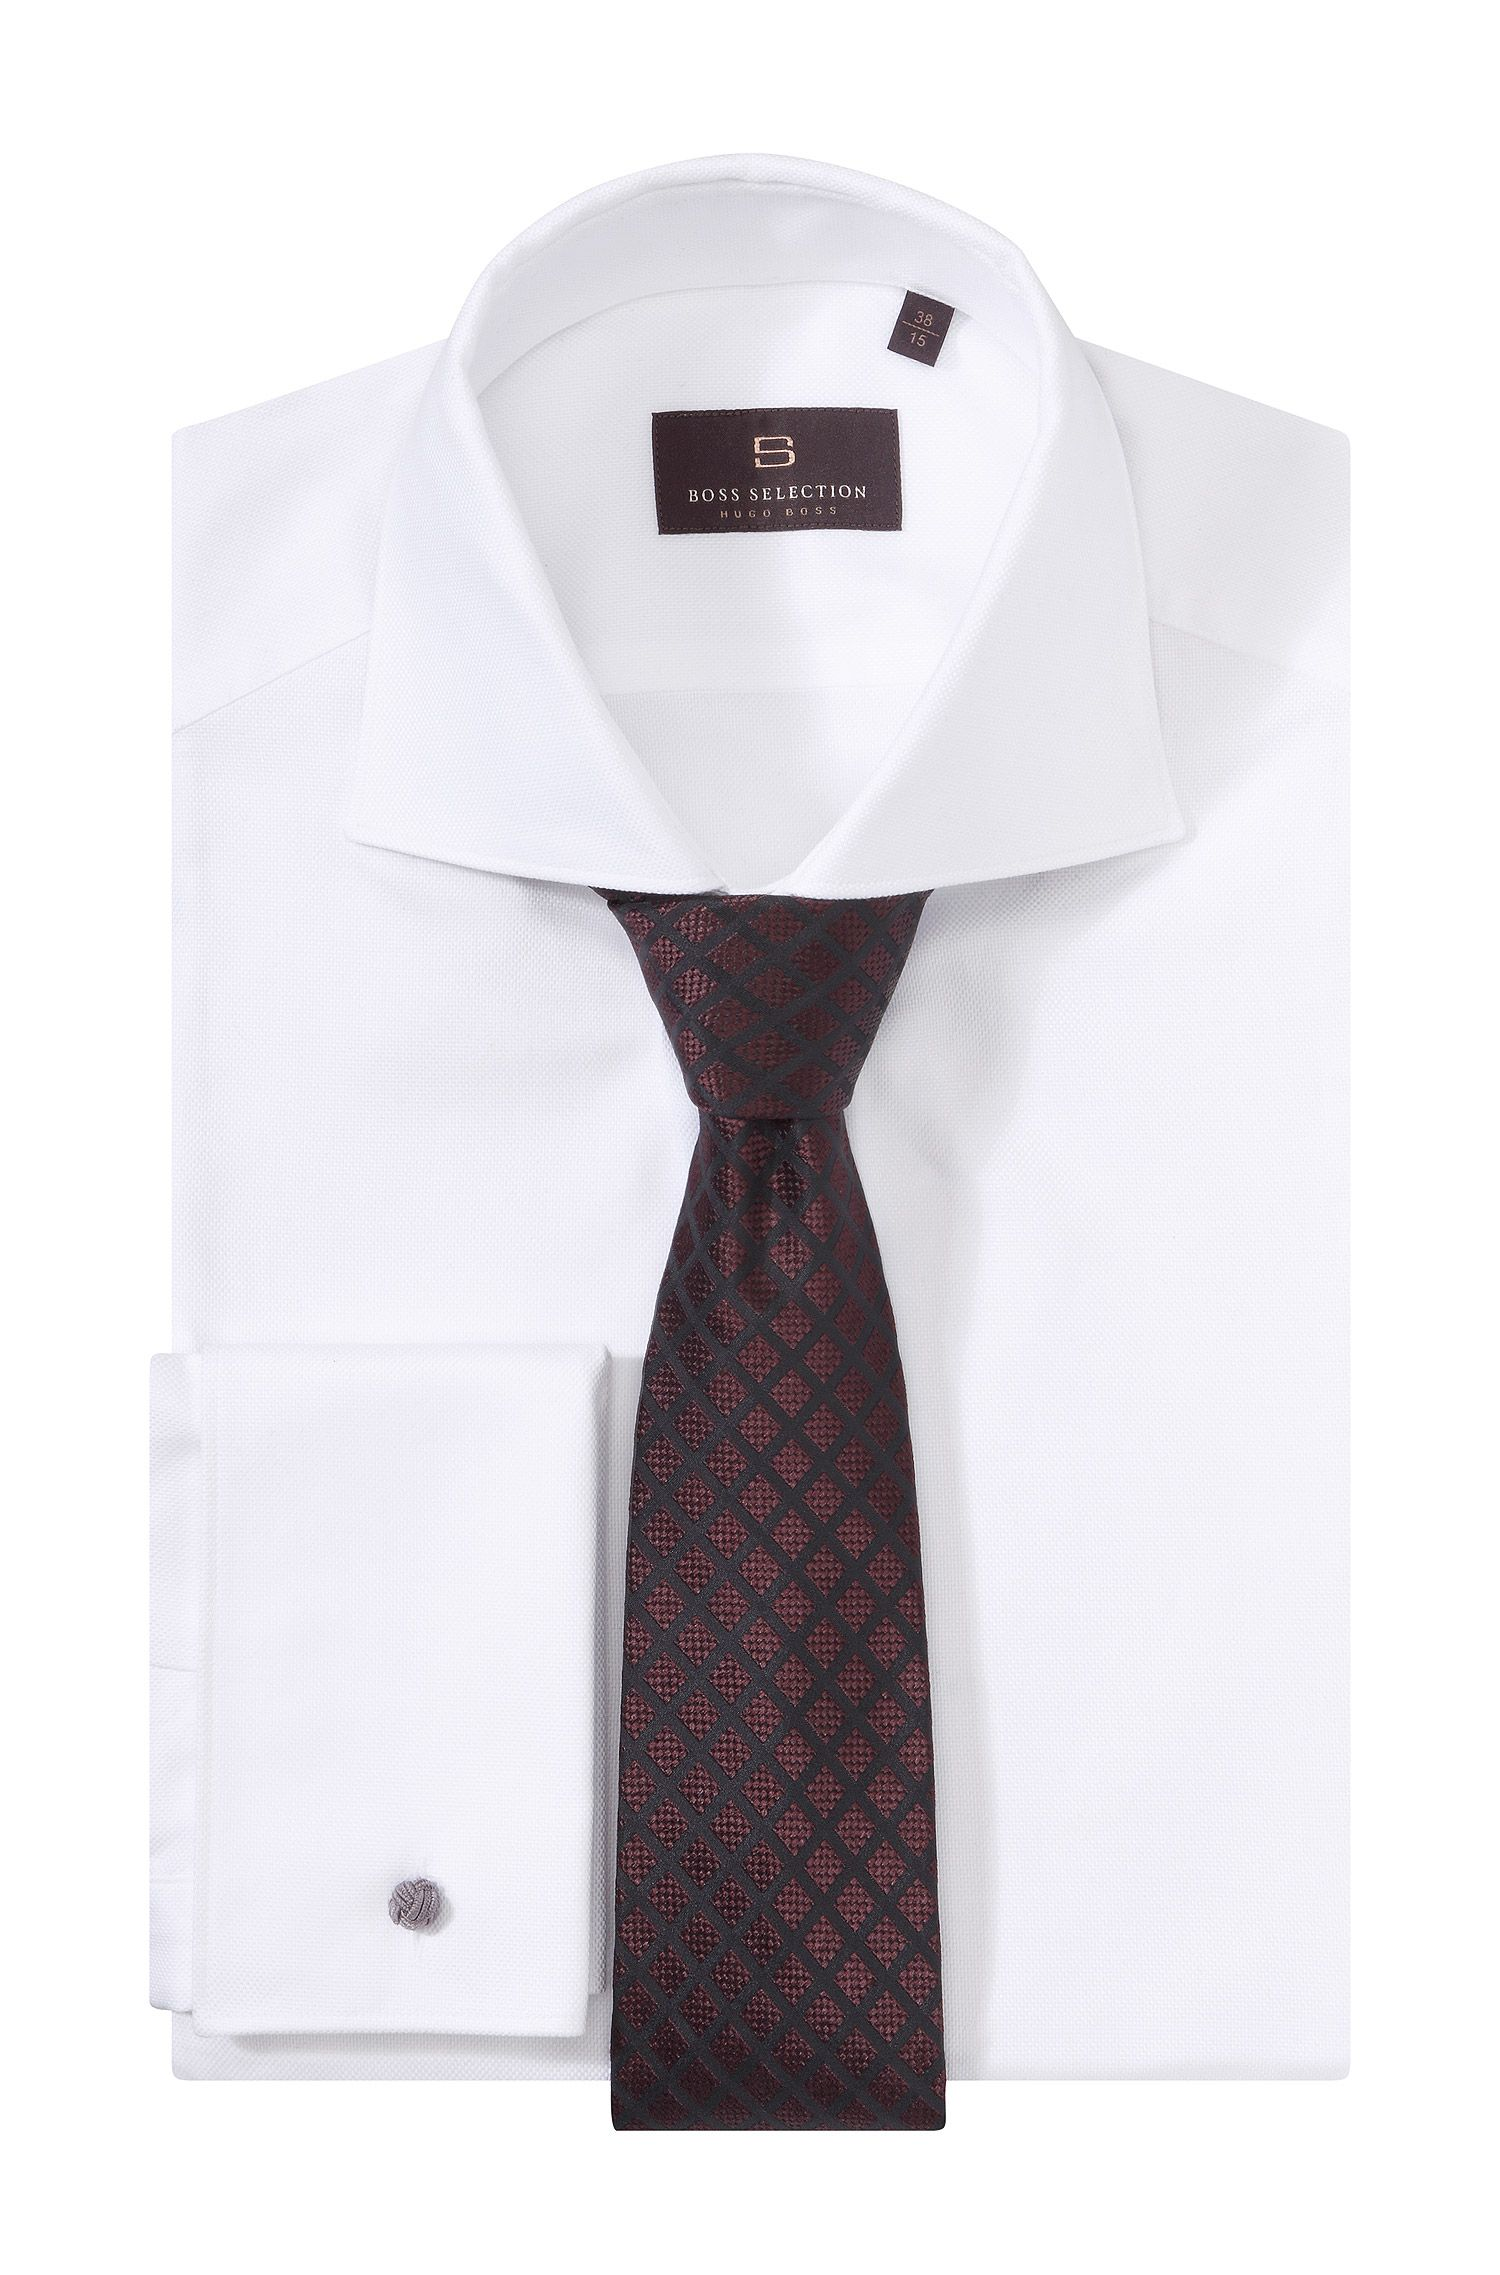 Cravate en pure soie, TIE CM 8